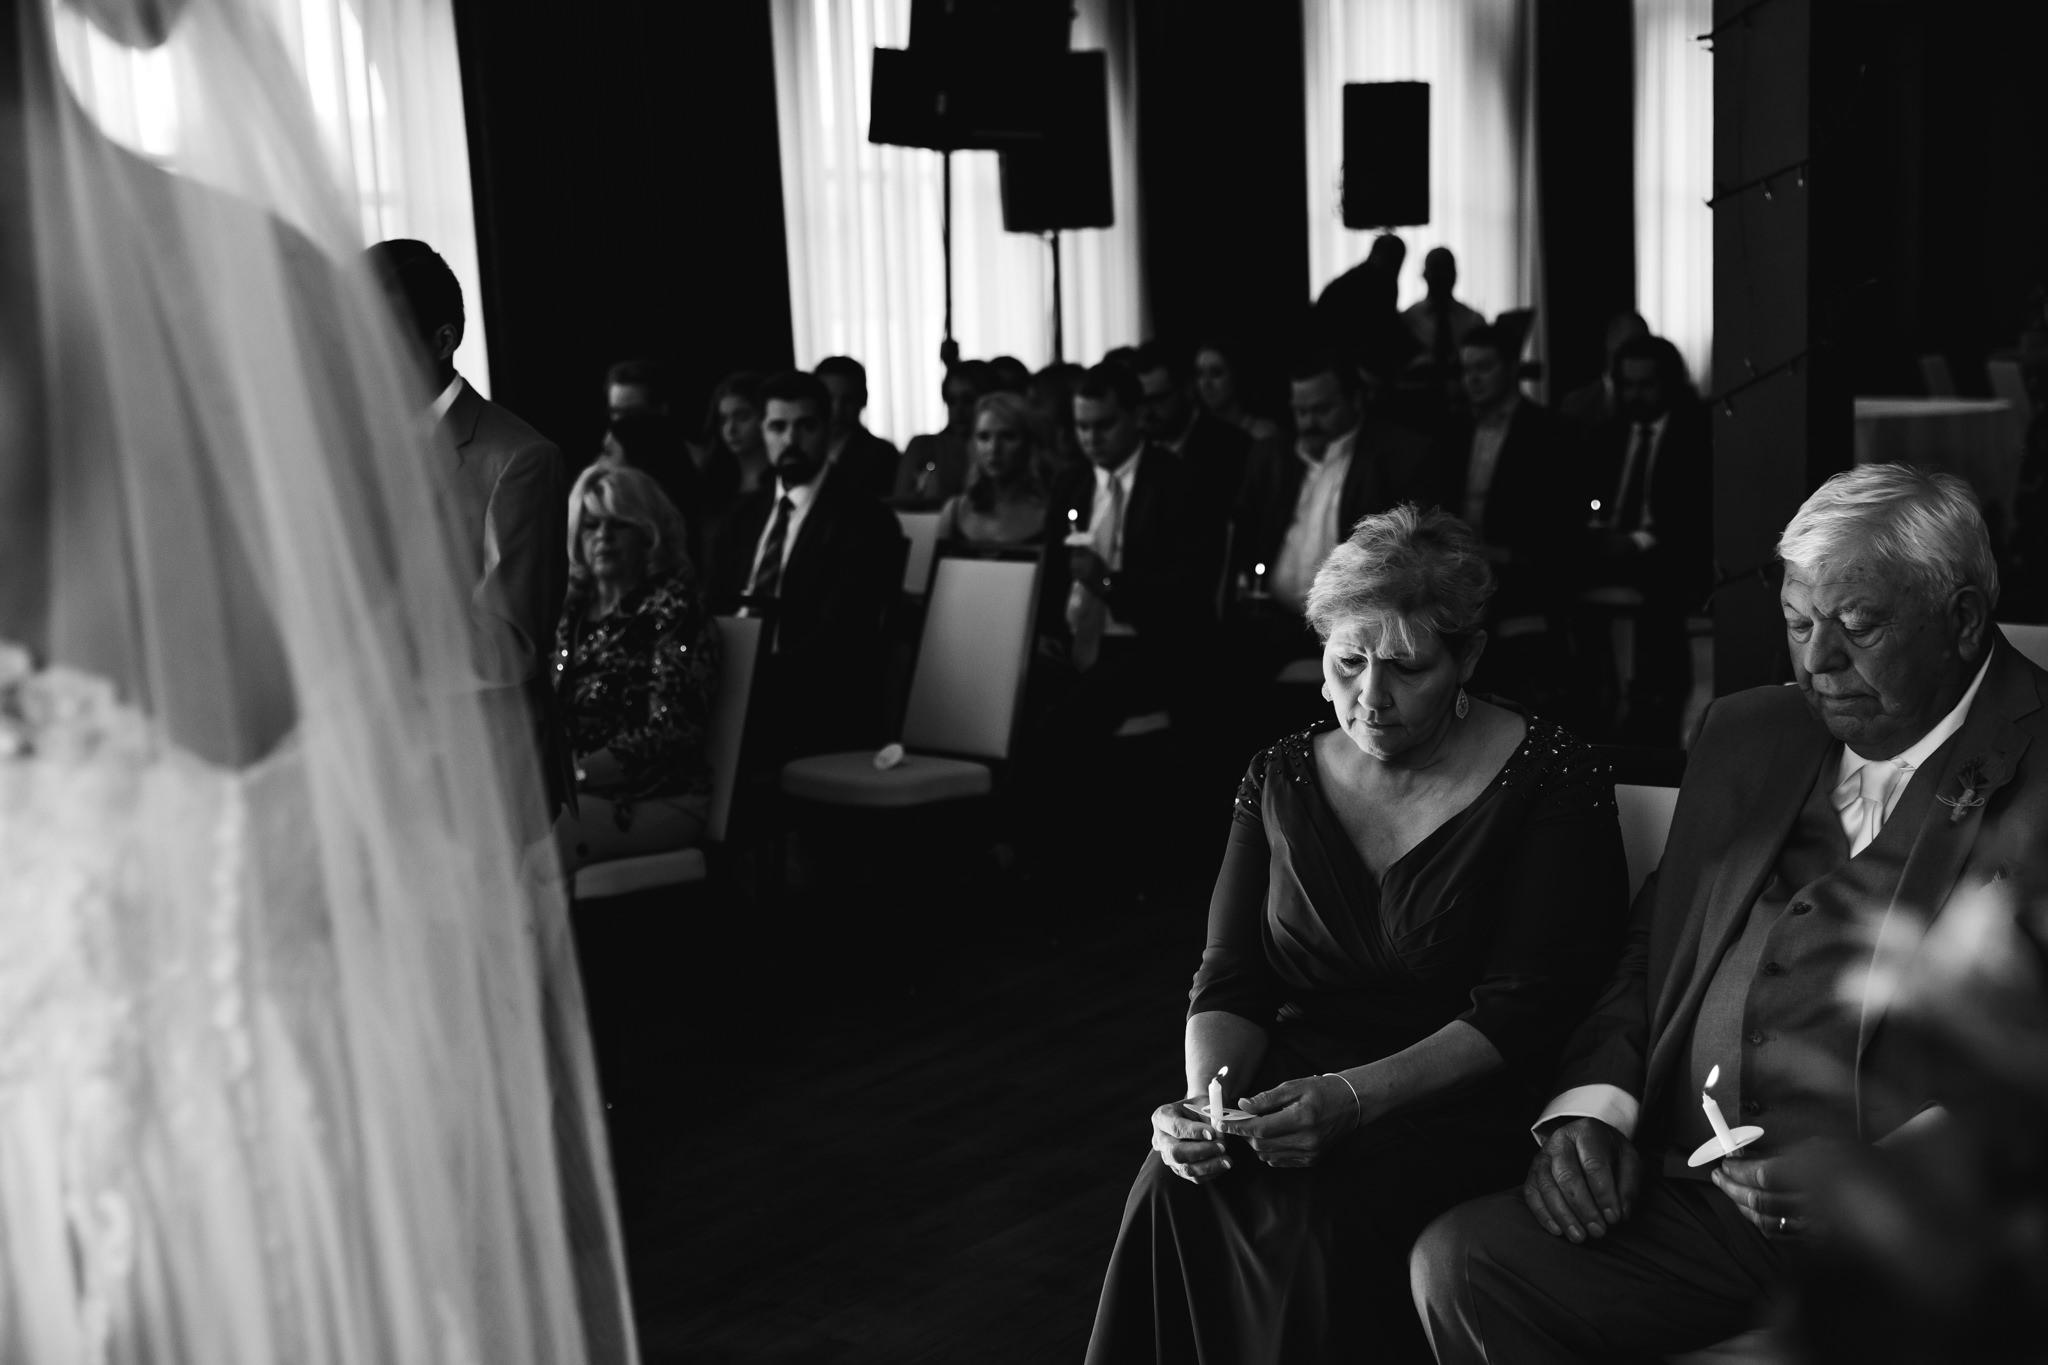 phantom-canyon-brewery-colorado-springs-wedding-photographer-181.jpg